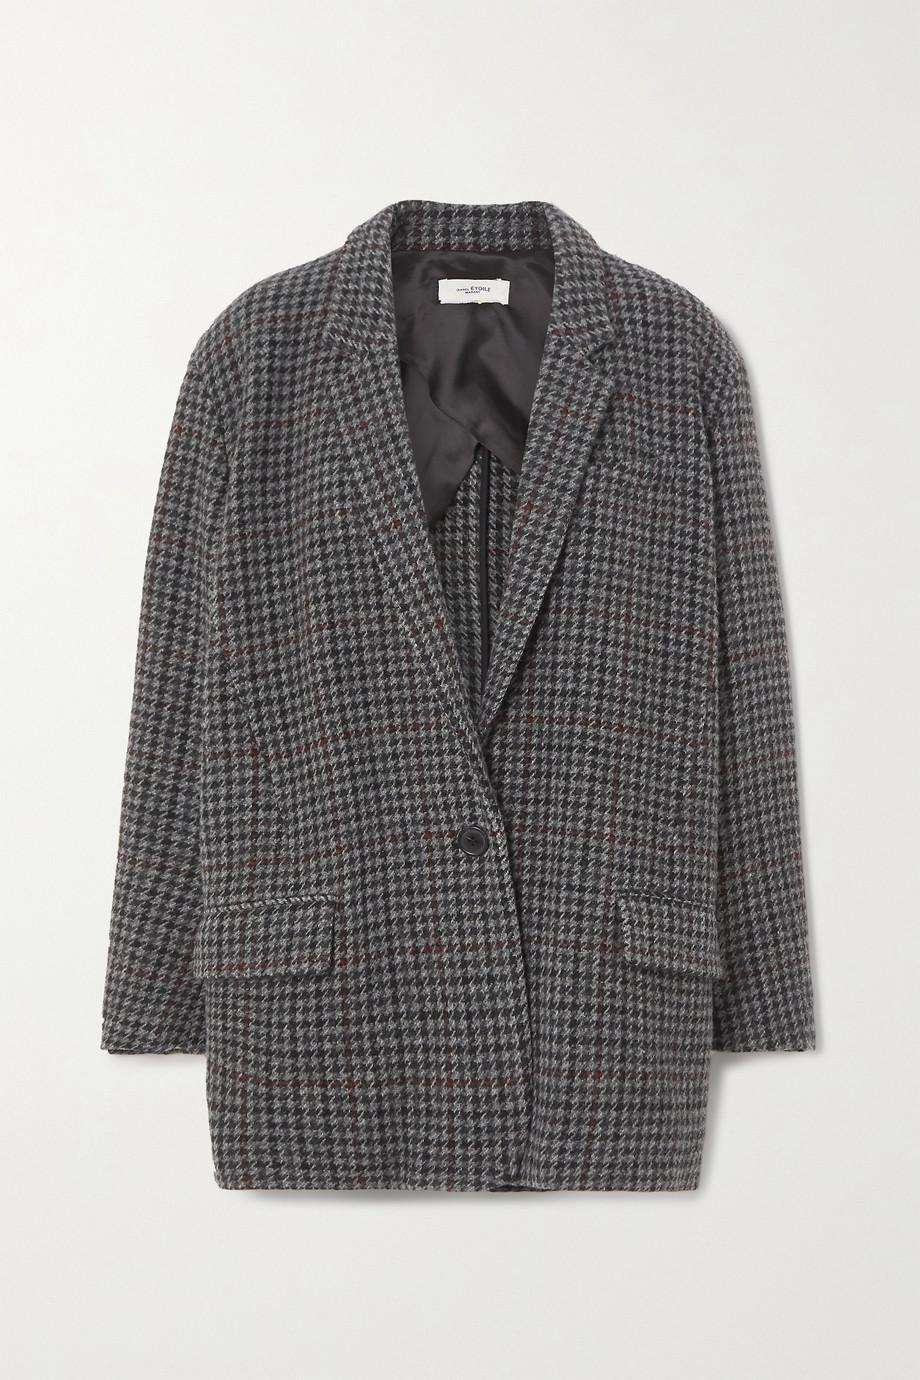 Isabel Marant Étoile Kaito houndstooth wool-tweed blazer